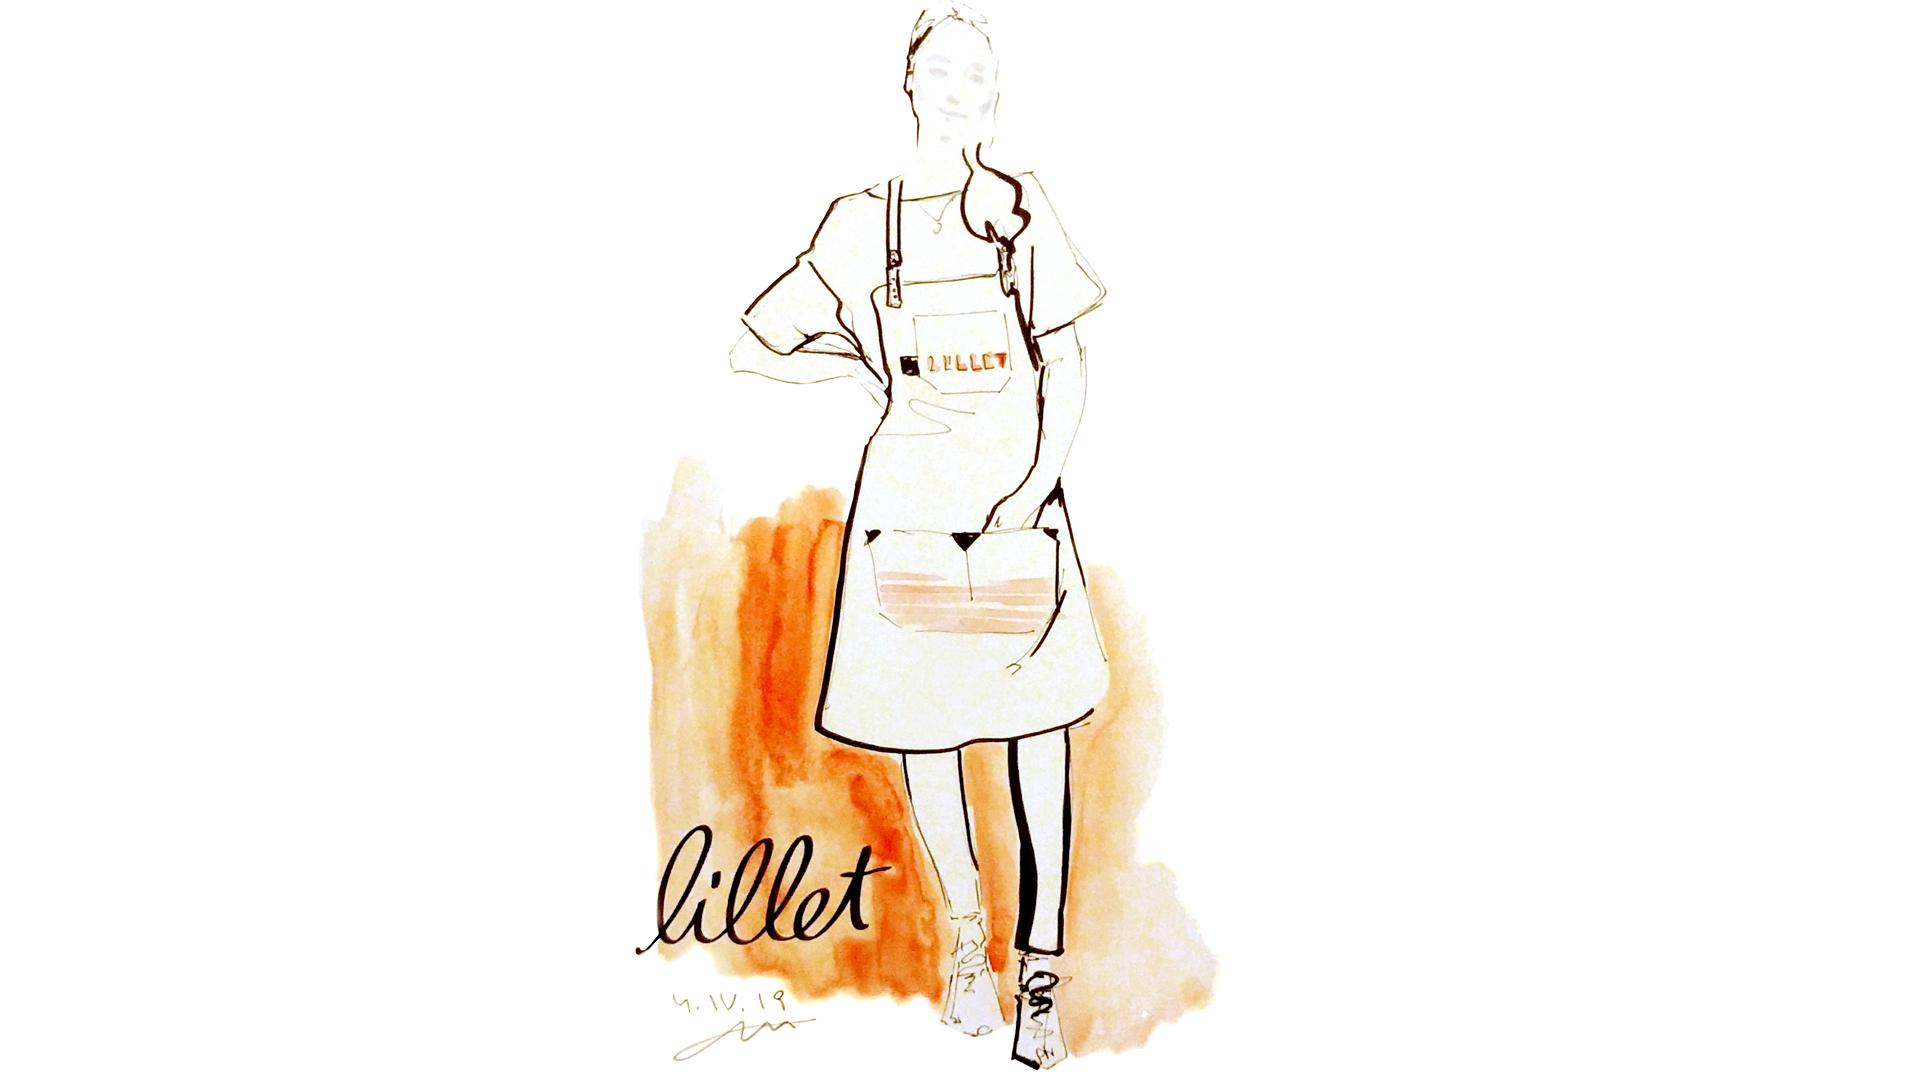 Live-Sketching-Fashion-Illustration-Event-Lillet-Virginia-Romo-8.jpg